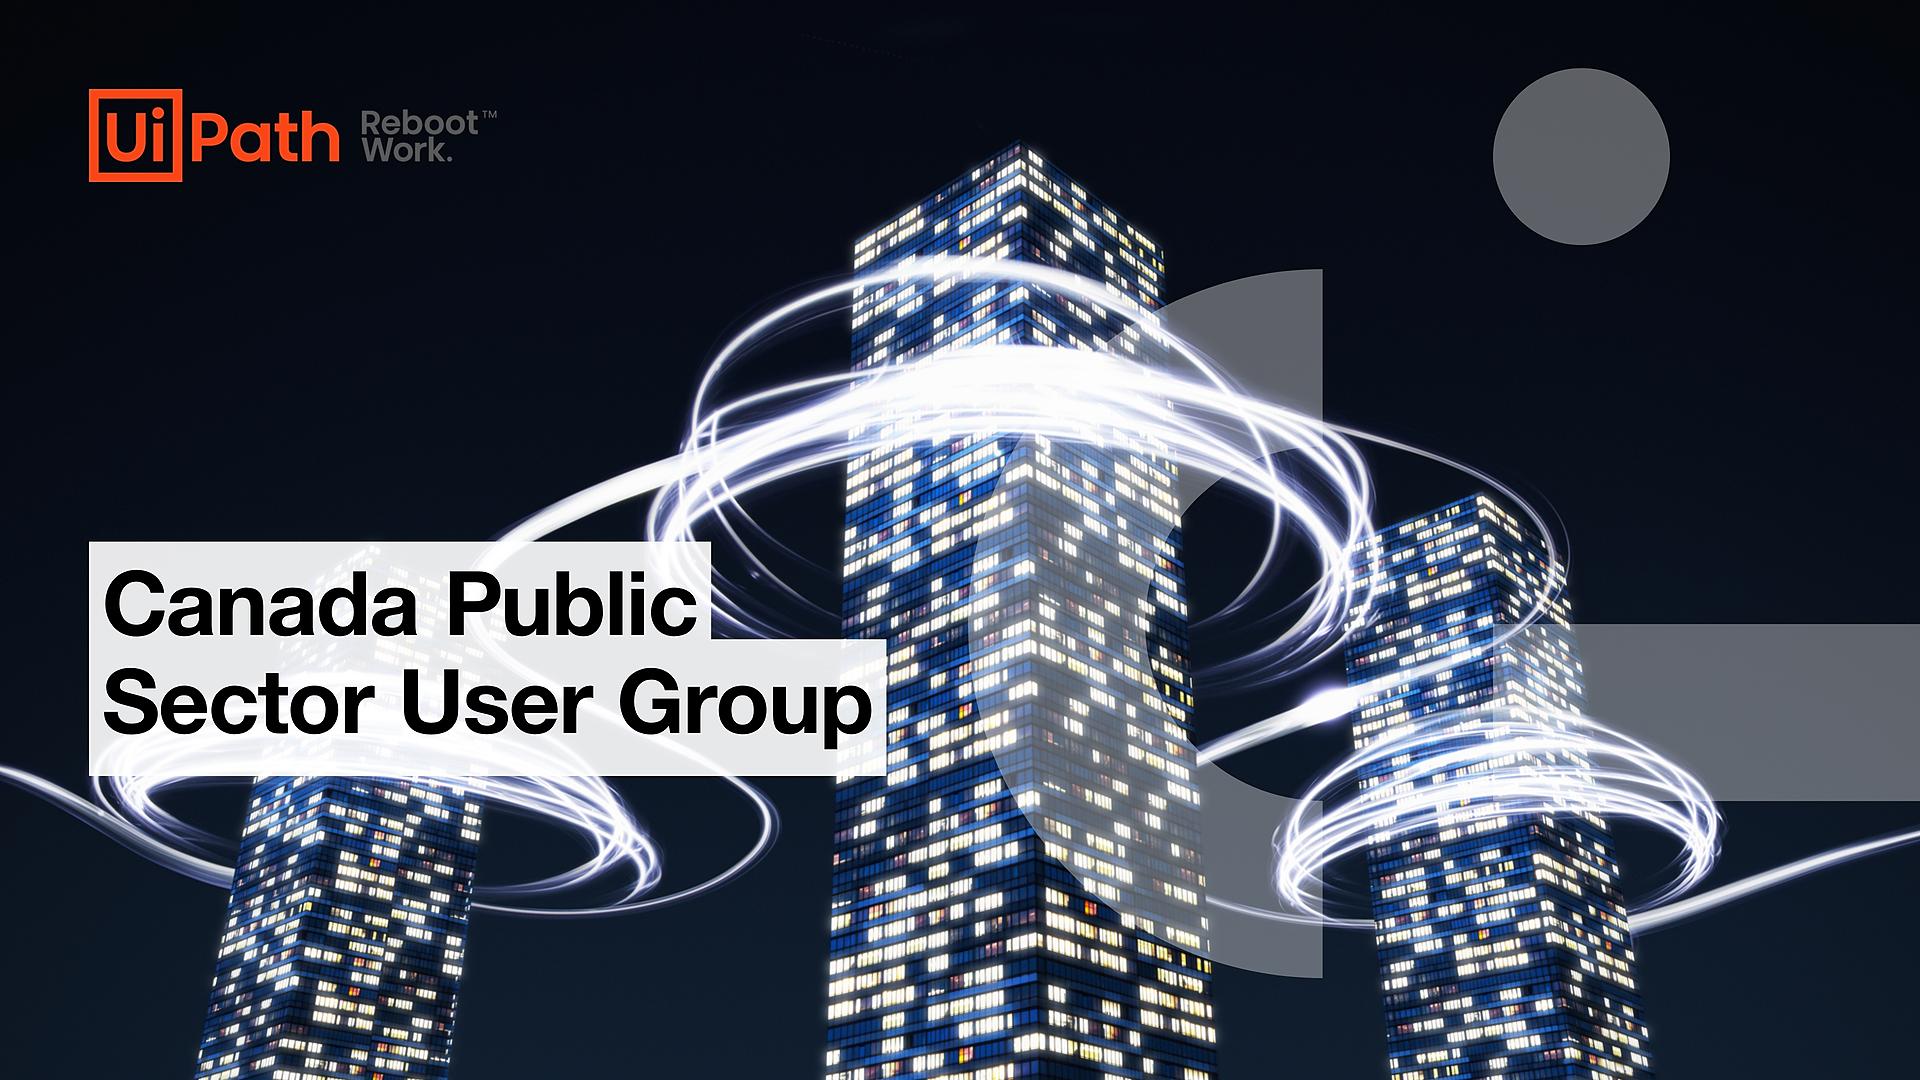 UiPath Canada Public Sector User Group - UW20FGUG3 (1)